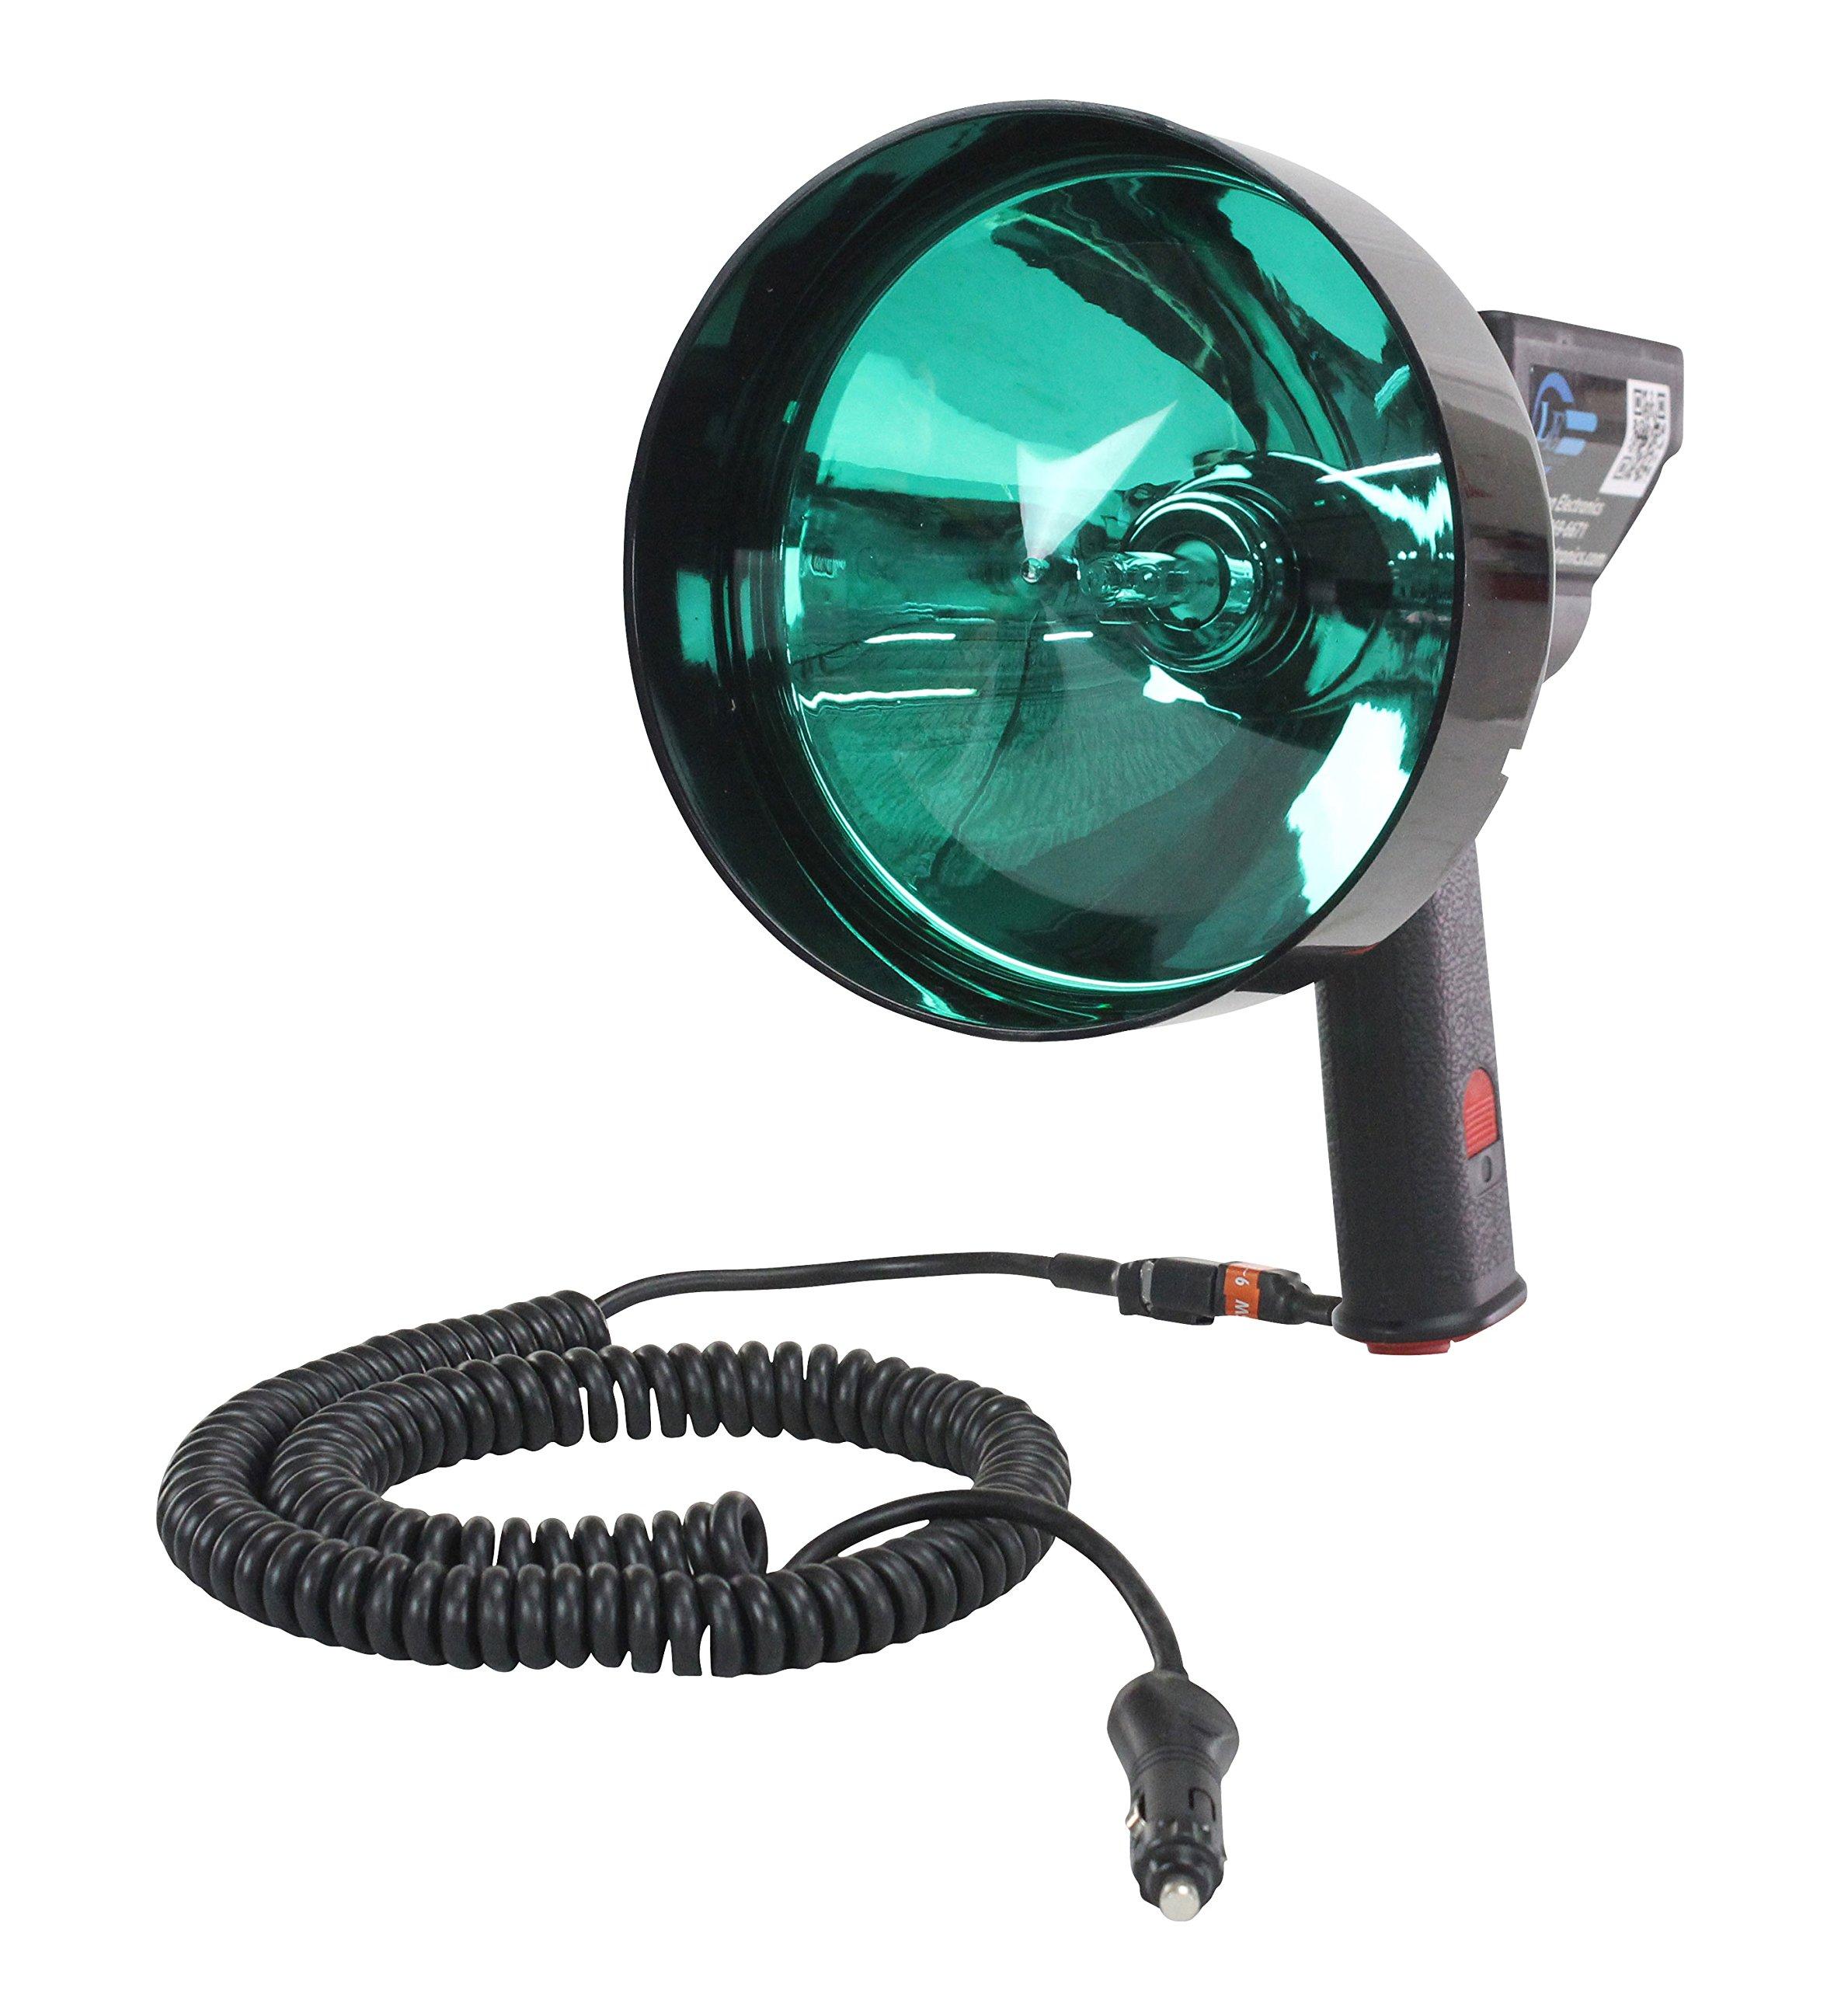 15 Million Candlepower Handheld Spotlight - Green Hunting Lens- Spot/Flood Combo - 5''/7'' Lens(-7 inch)